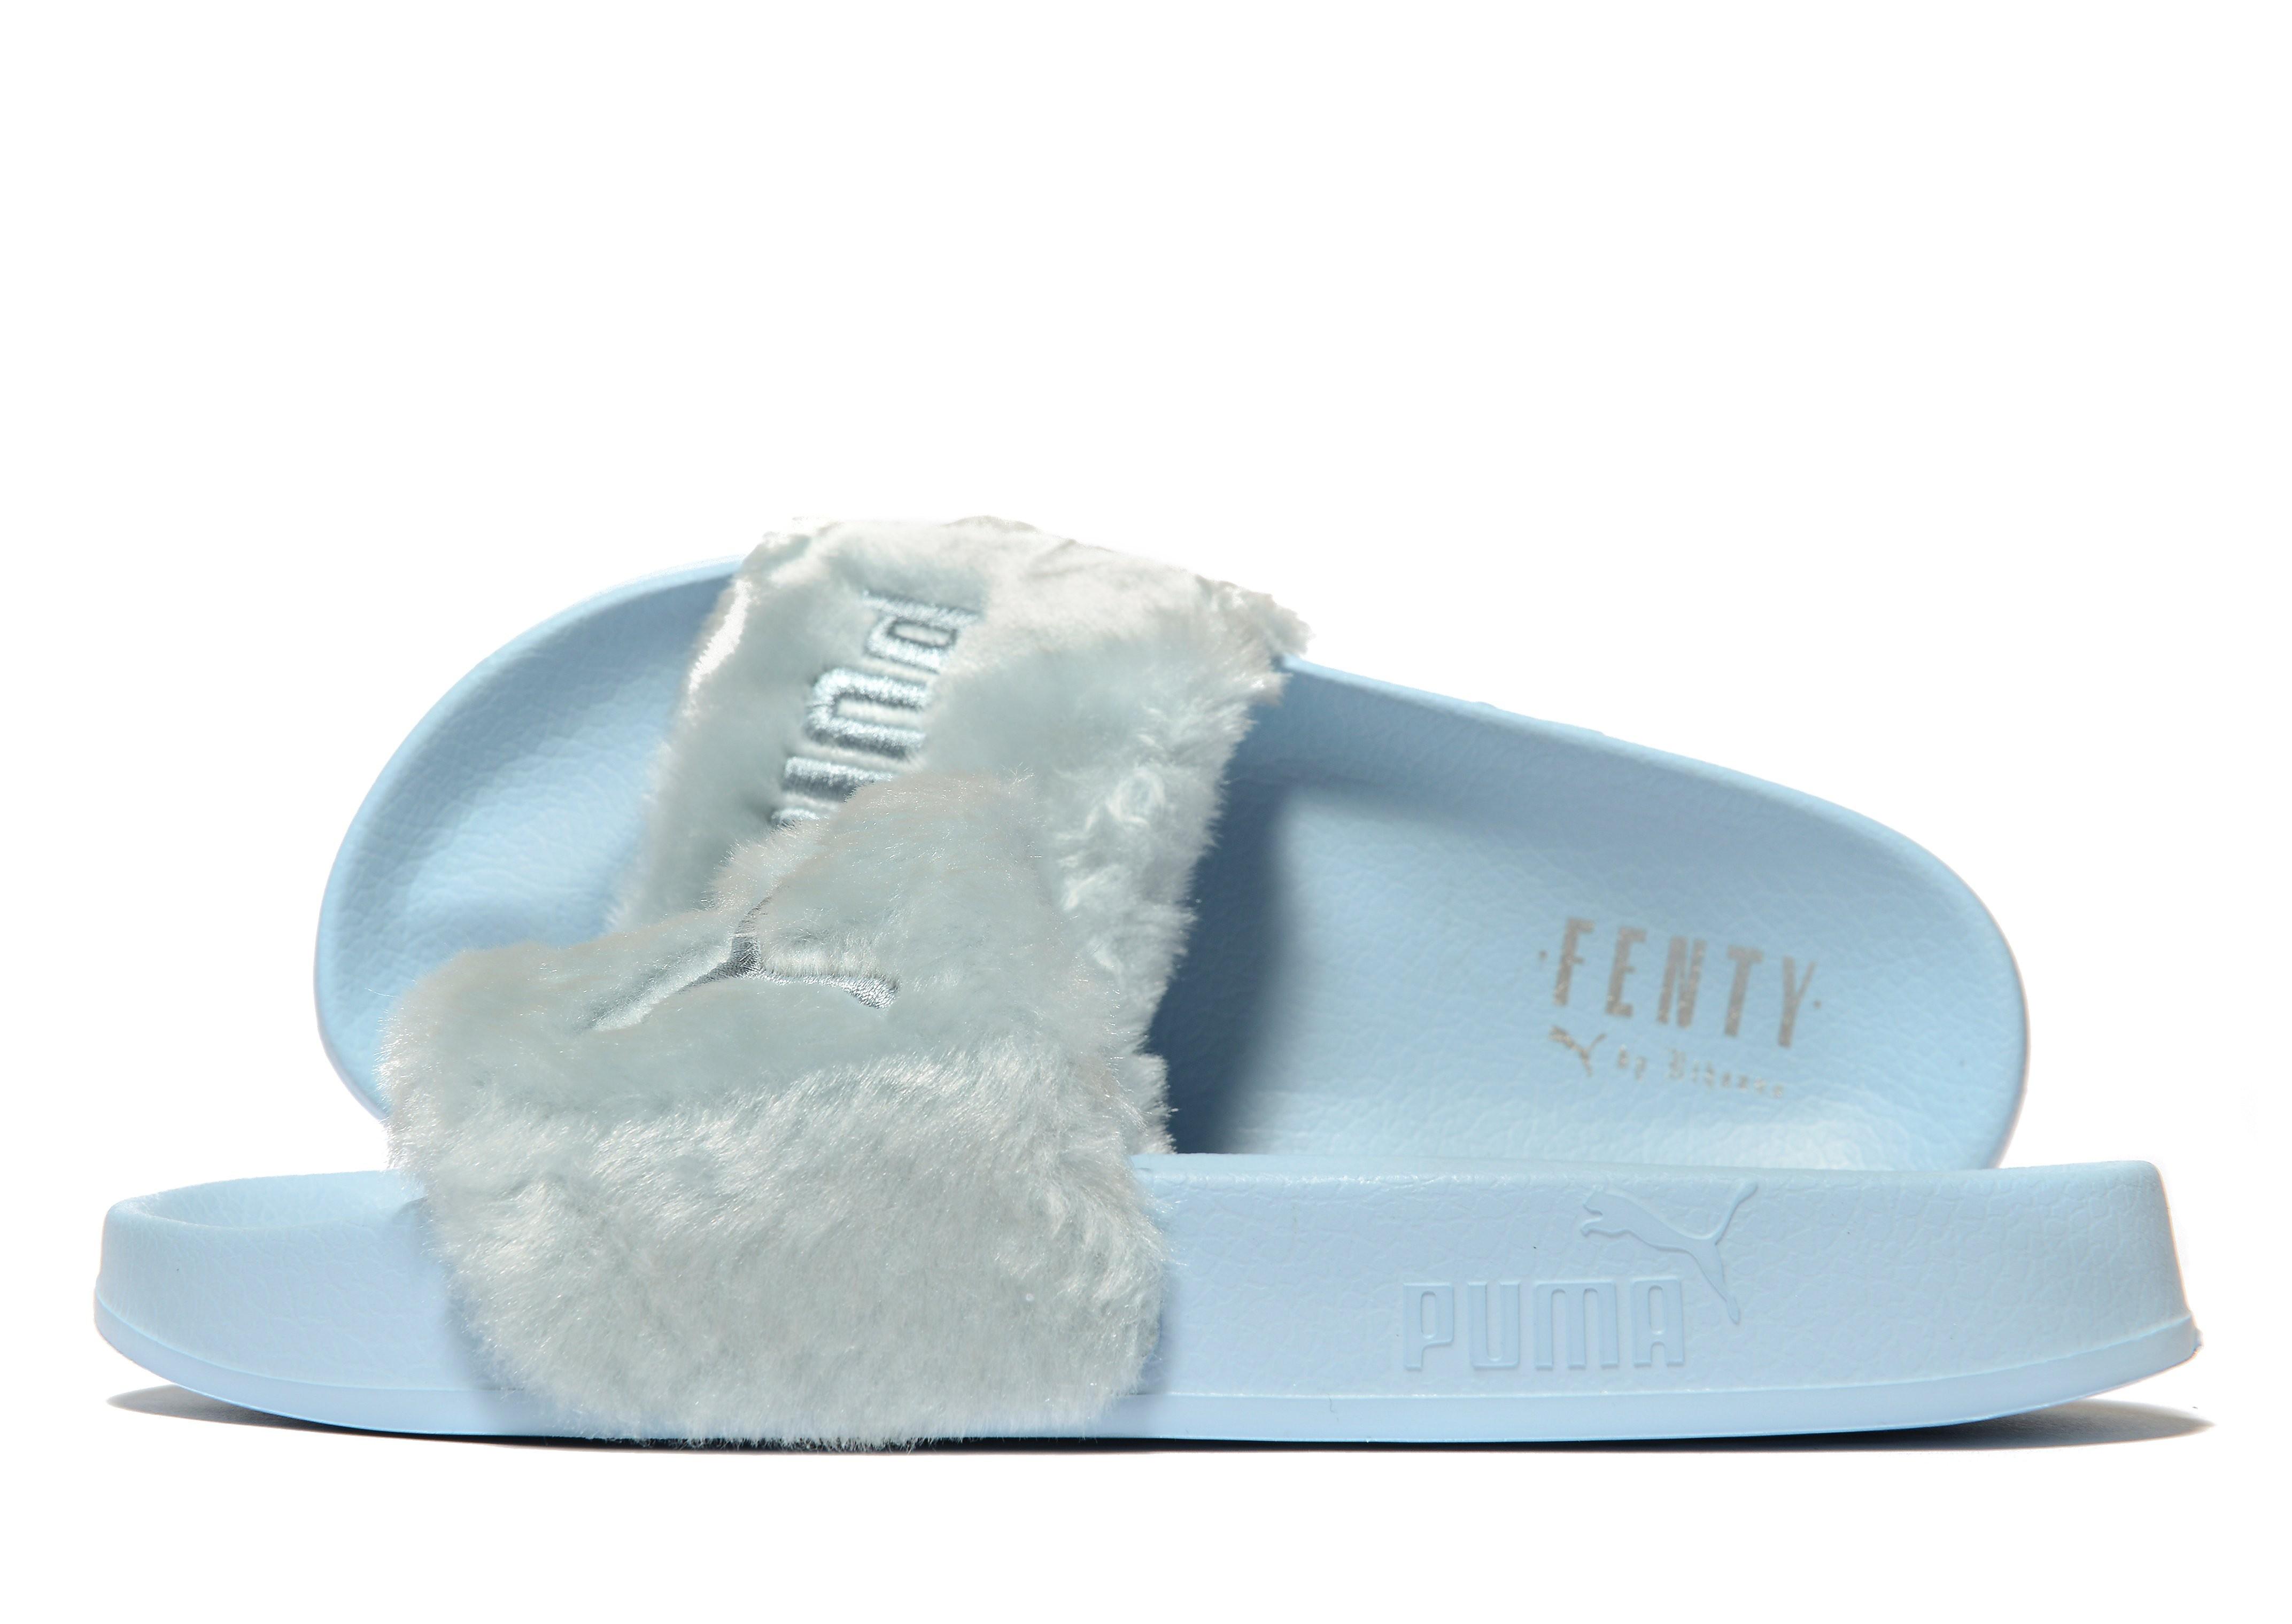 PUMA Fenty Fur Slides Women's